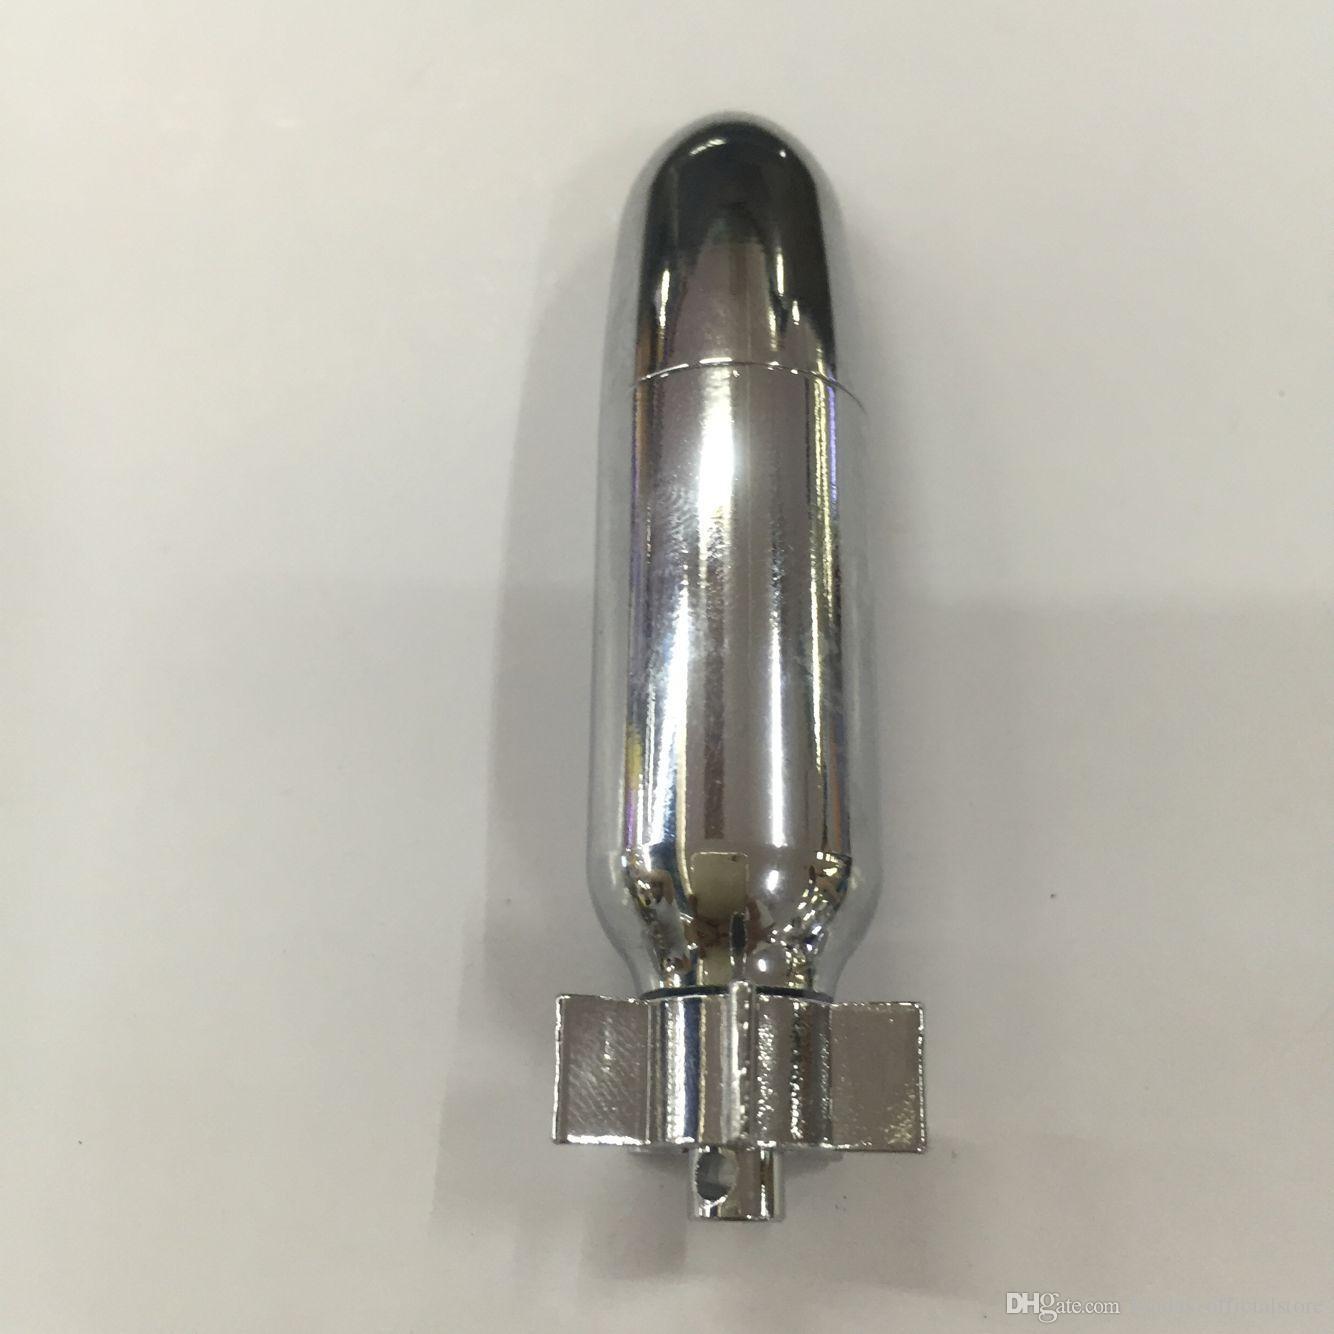 Míssil de Metal/Bomba/Forma Bala USB Flash Drive Pen Driver Memory Stick USB De Armazenamento de Dados em Disco U Pendrive